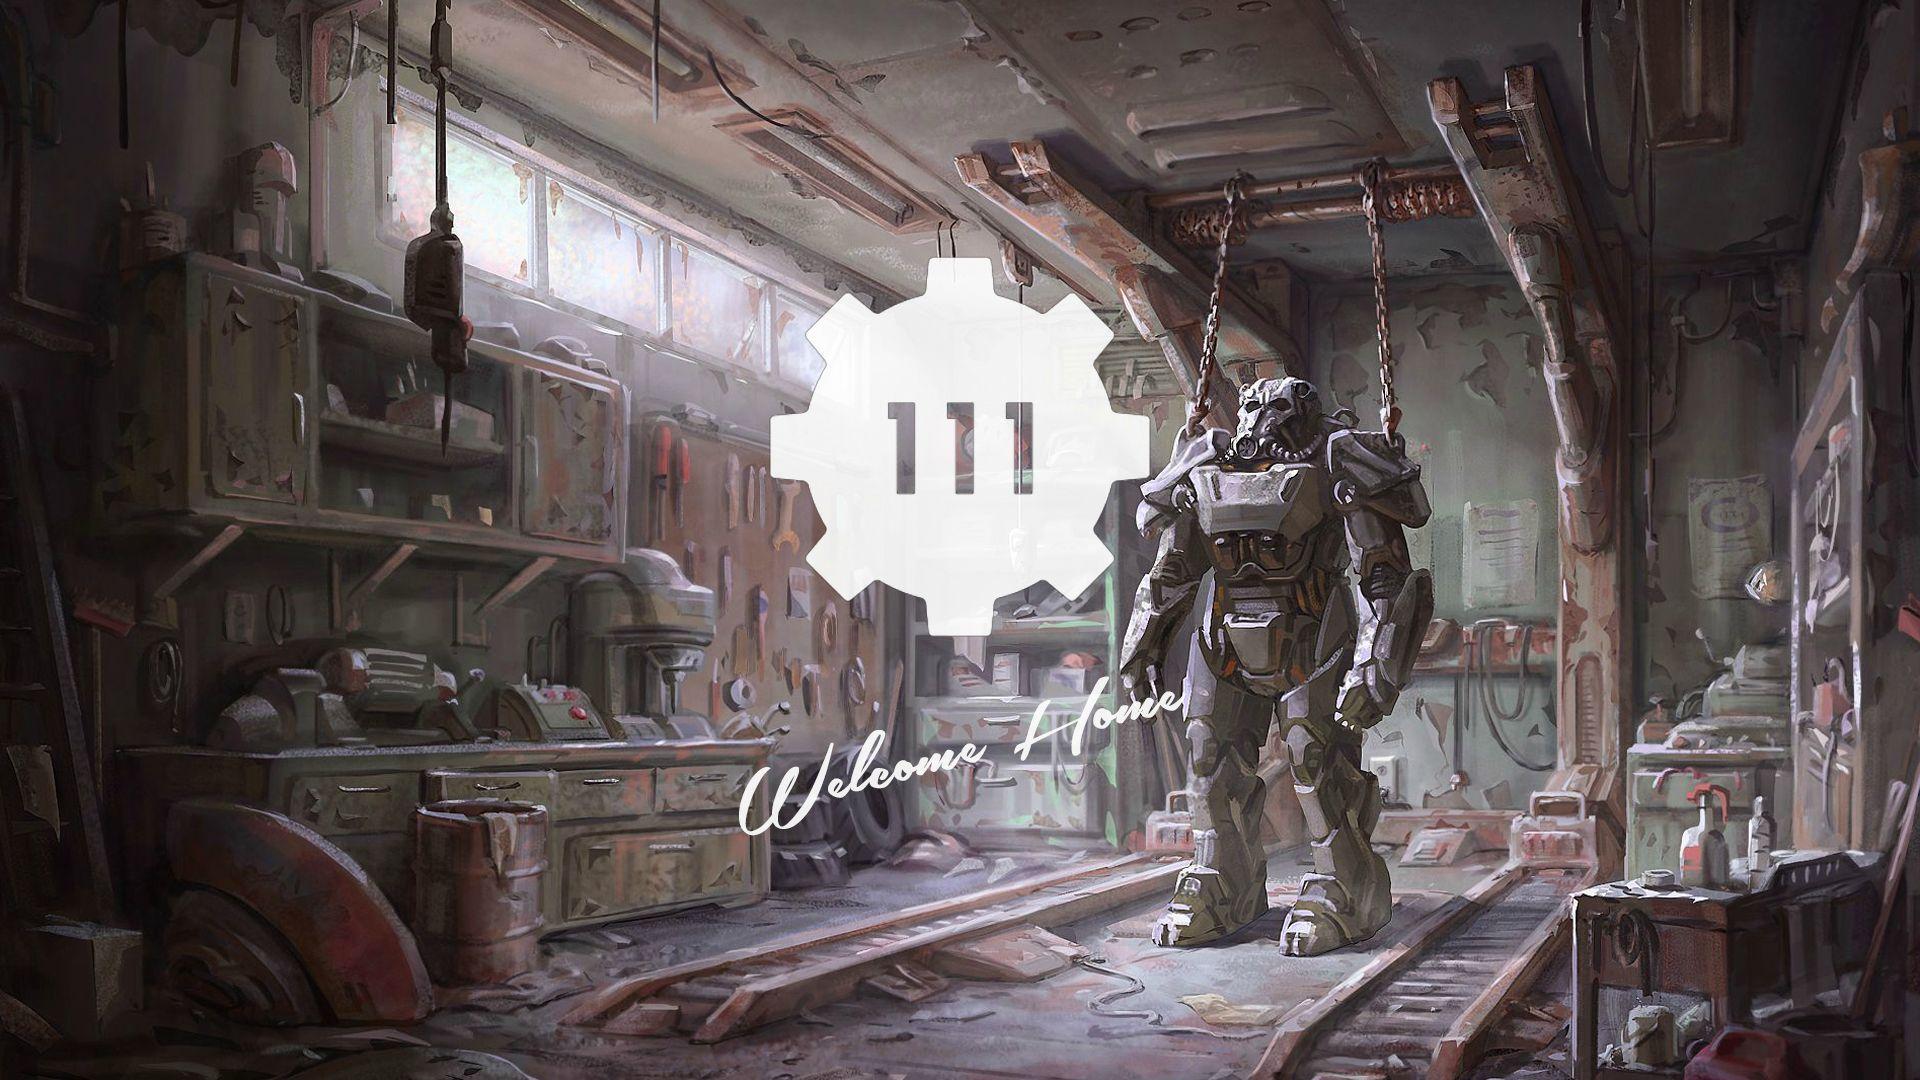 Fallout 4 Custom Concept Art Wallpaper Fallout 4 Concept Art Fallout Concept Art Fallout 4 Wallpapers